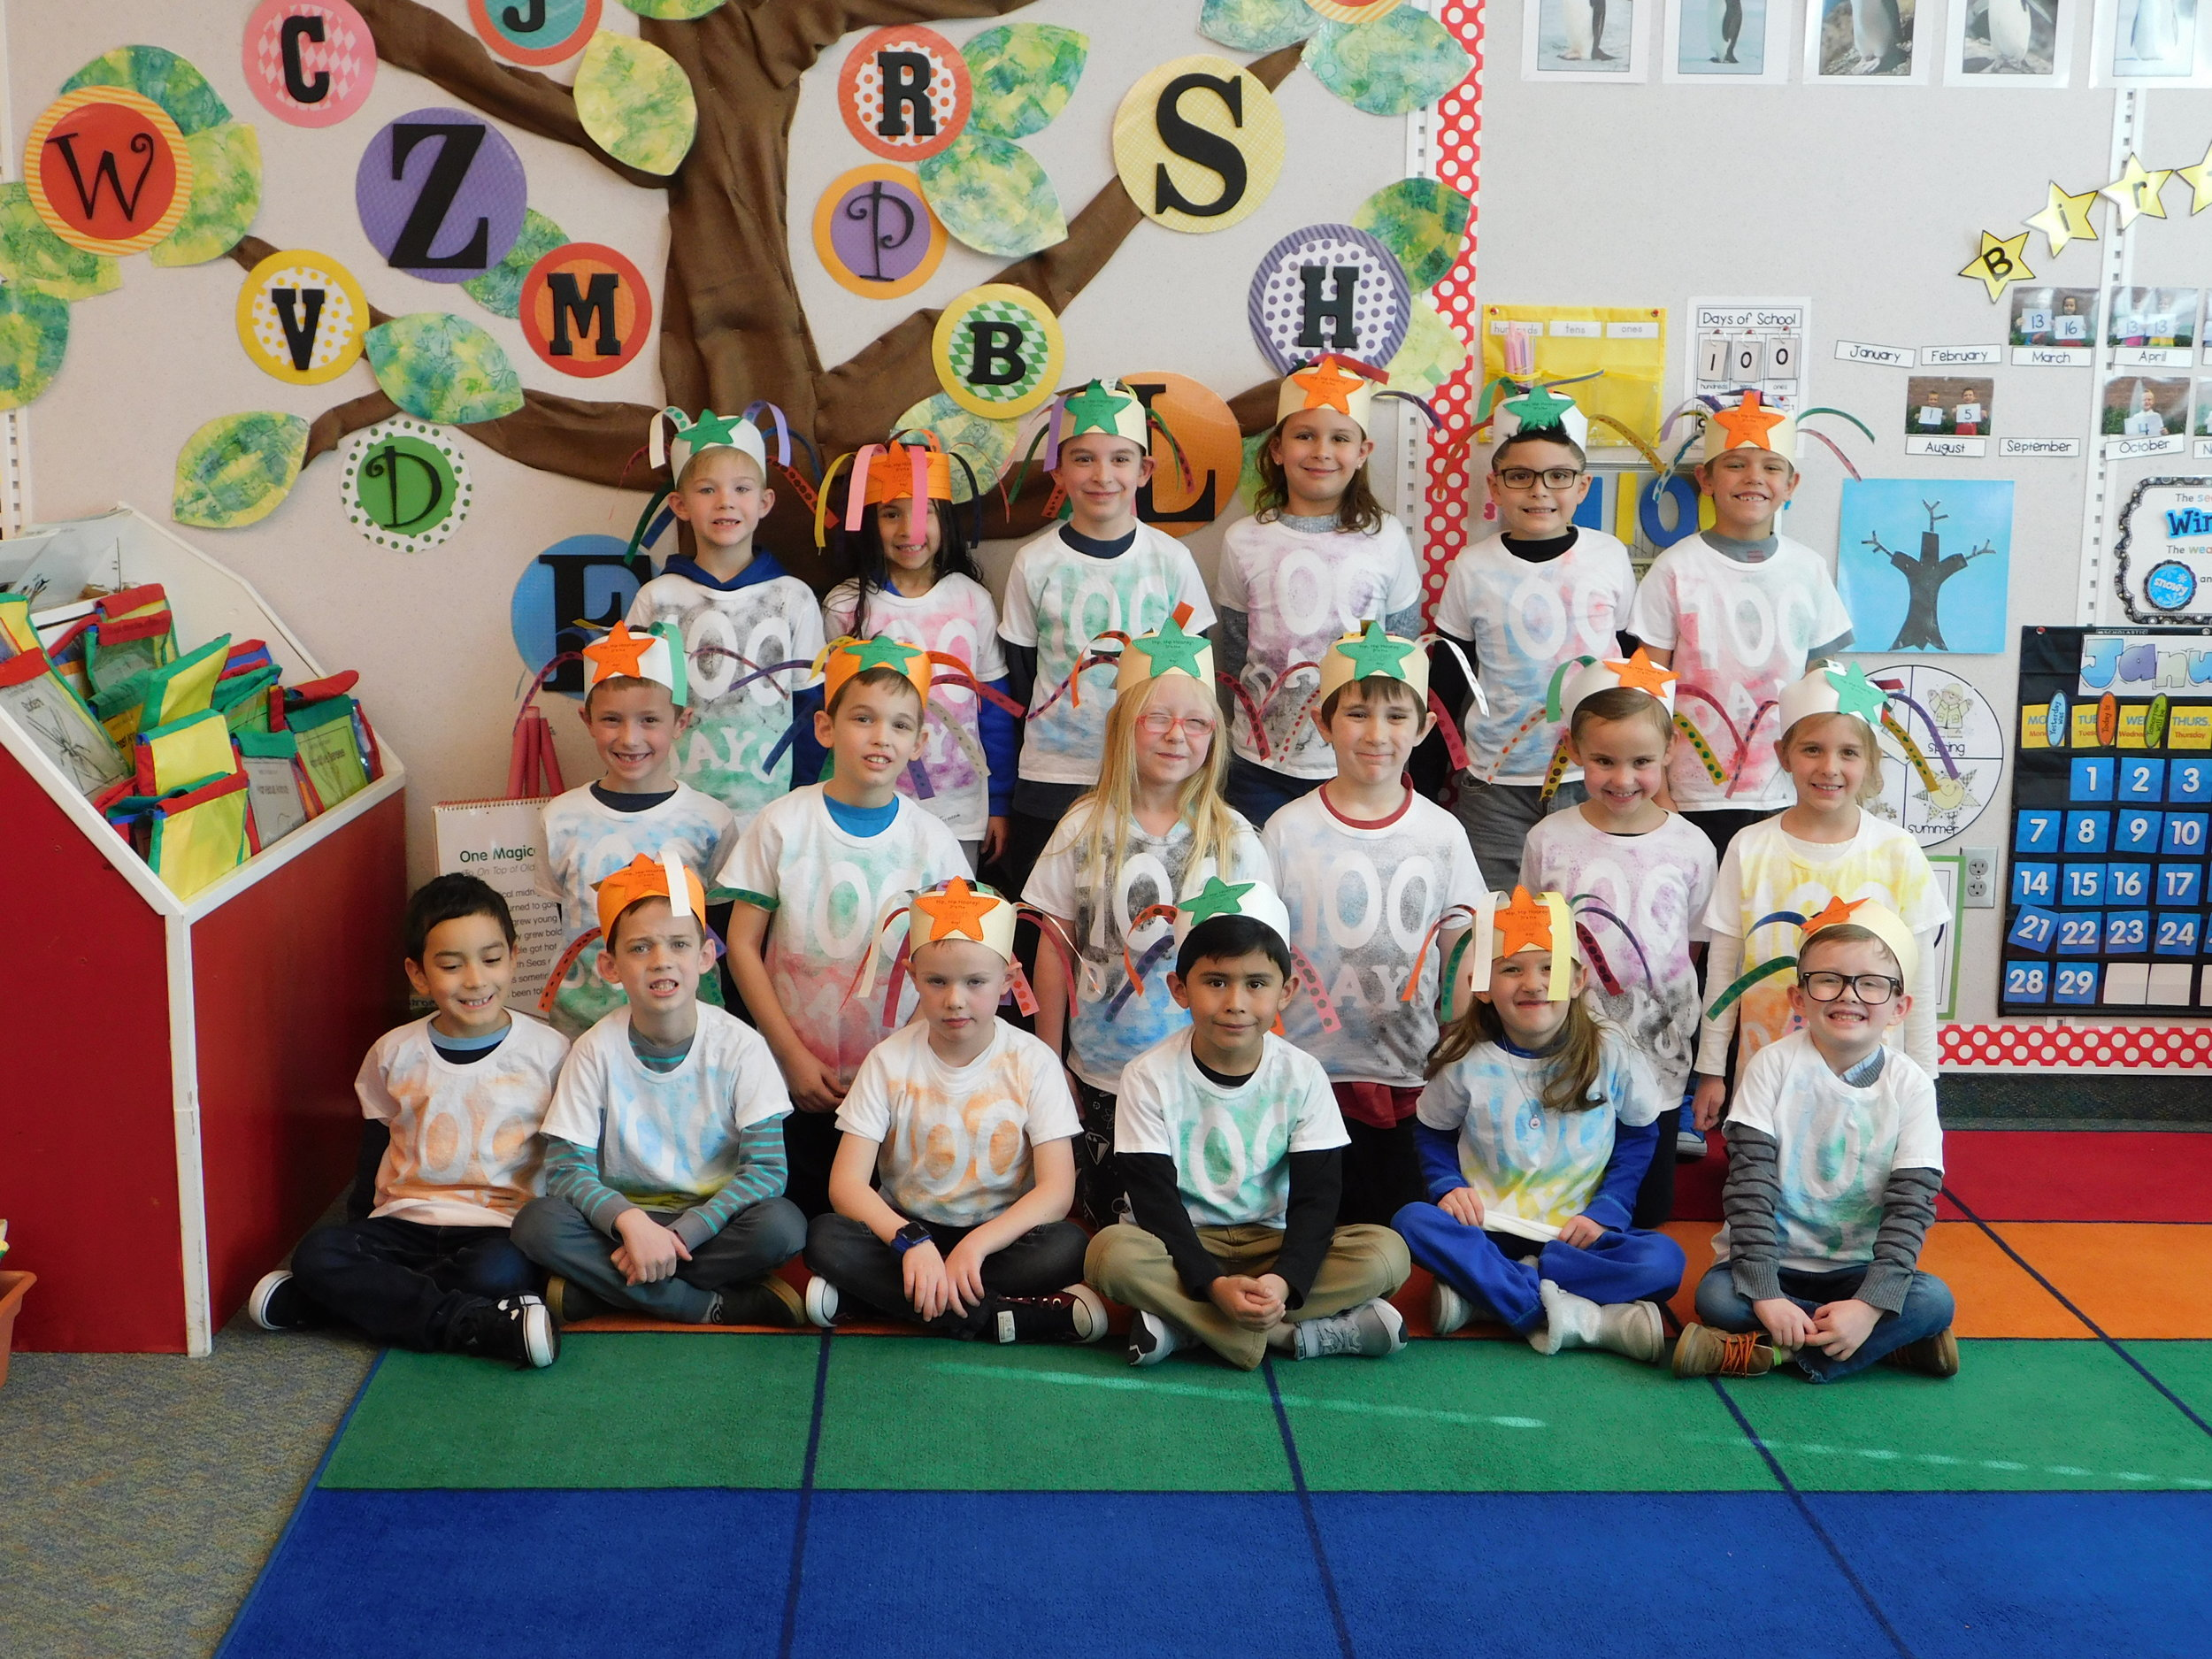 Wilson Elementary School    Learn More About Wilson